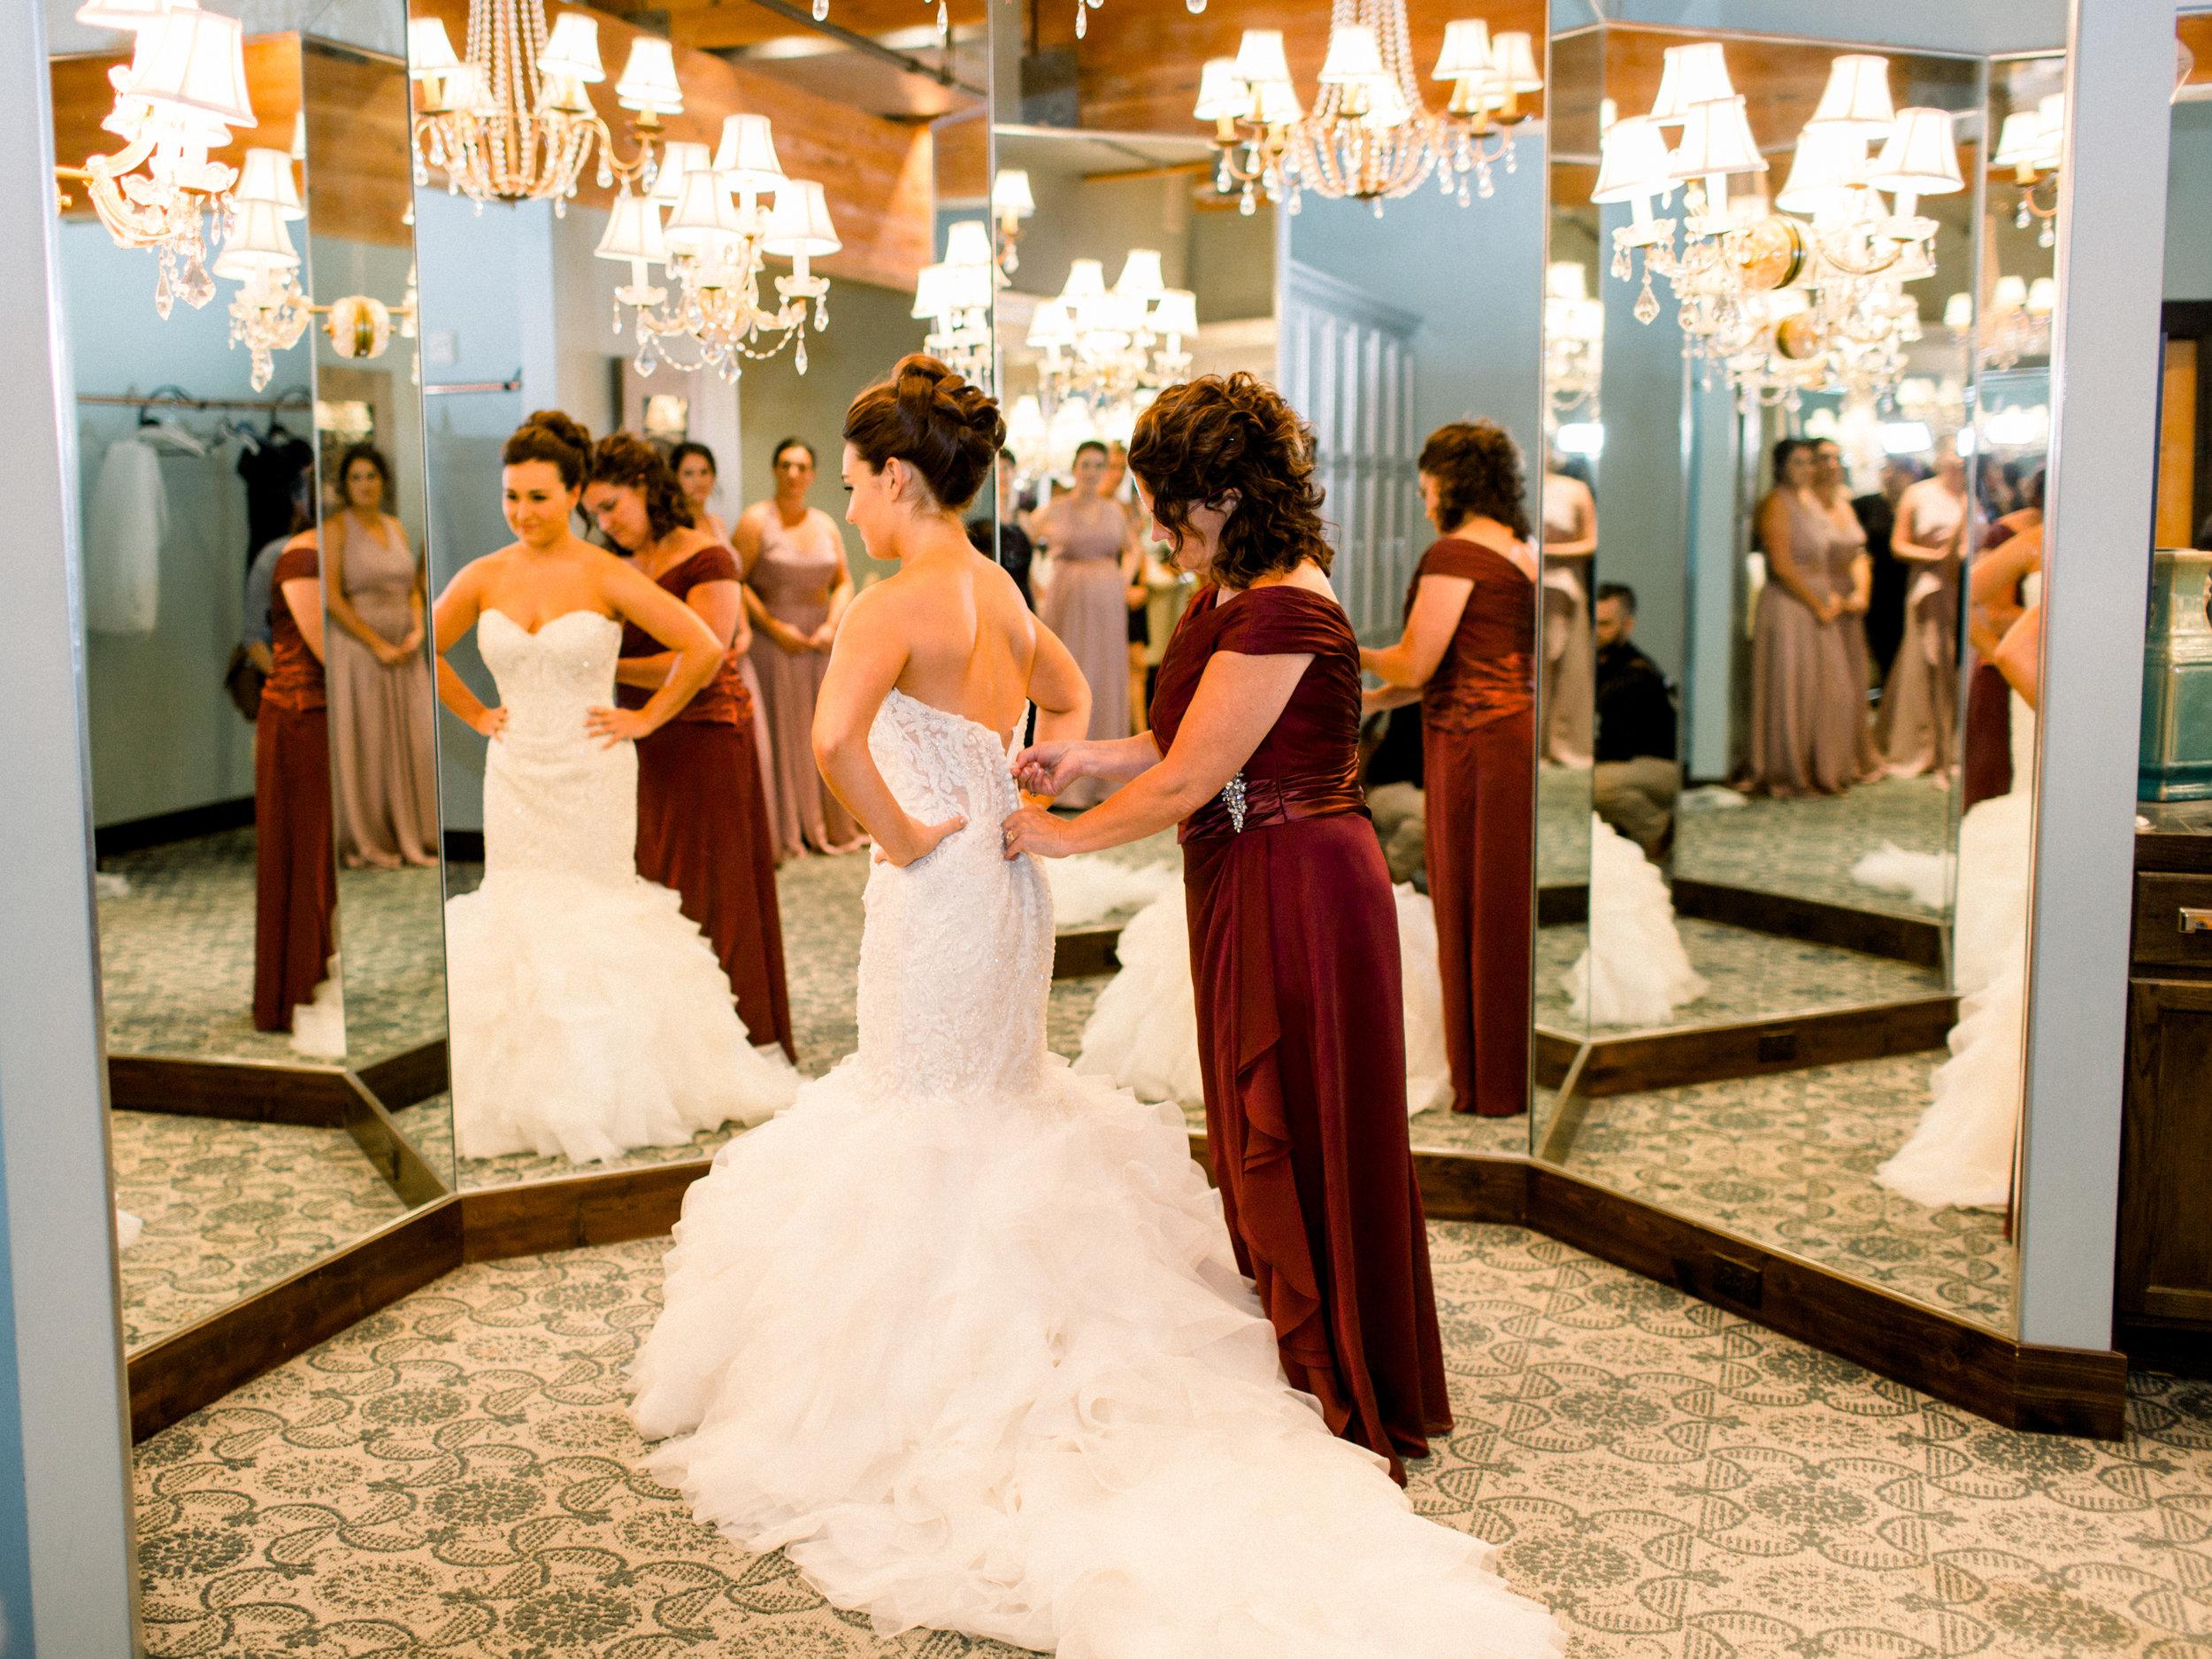 Bride Putting on Dress.jpg